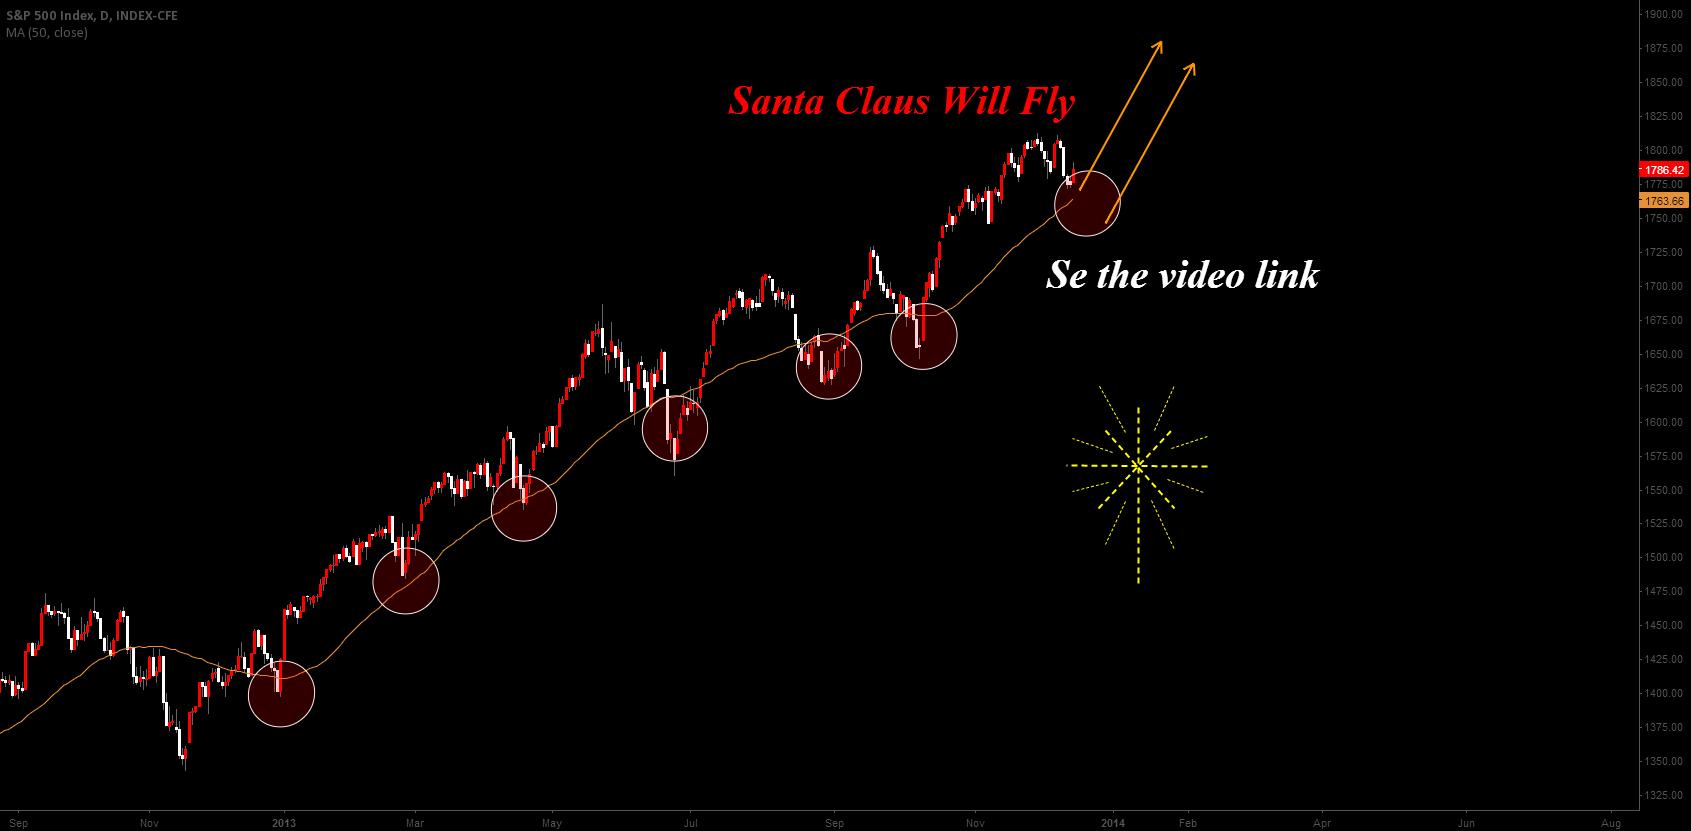 Santa Claus Will Fly